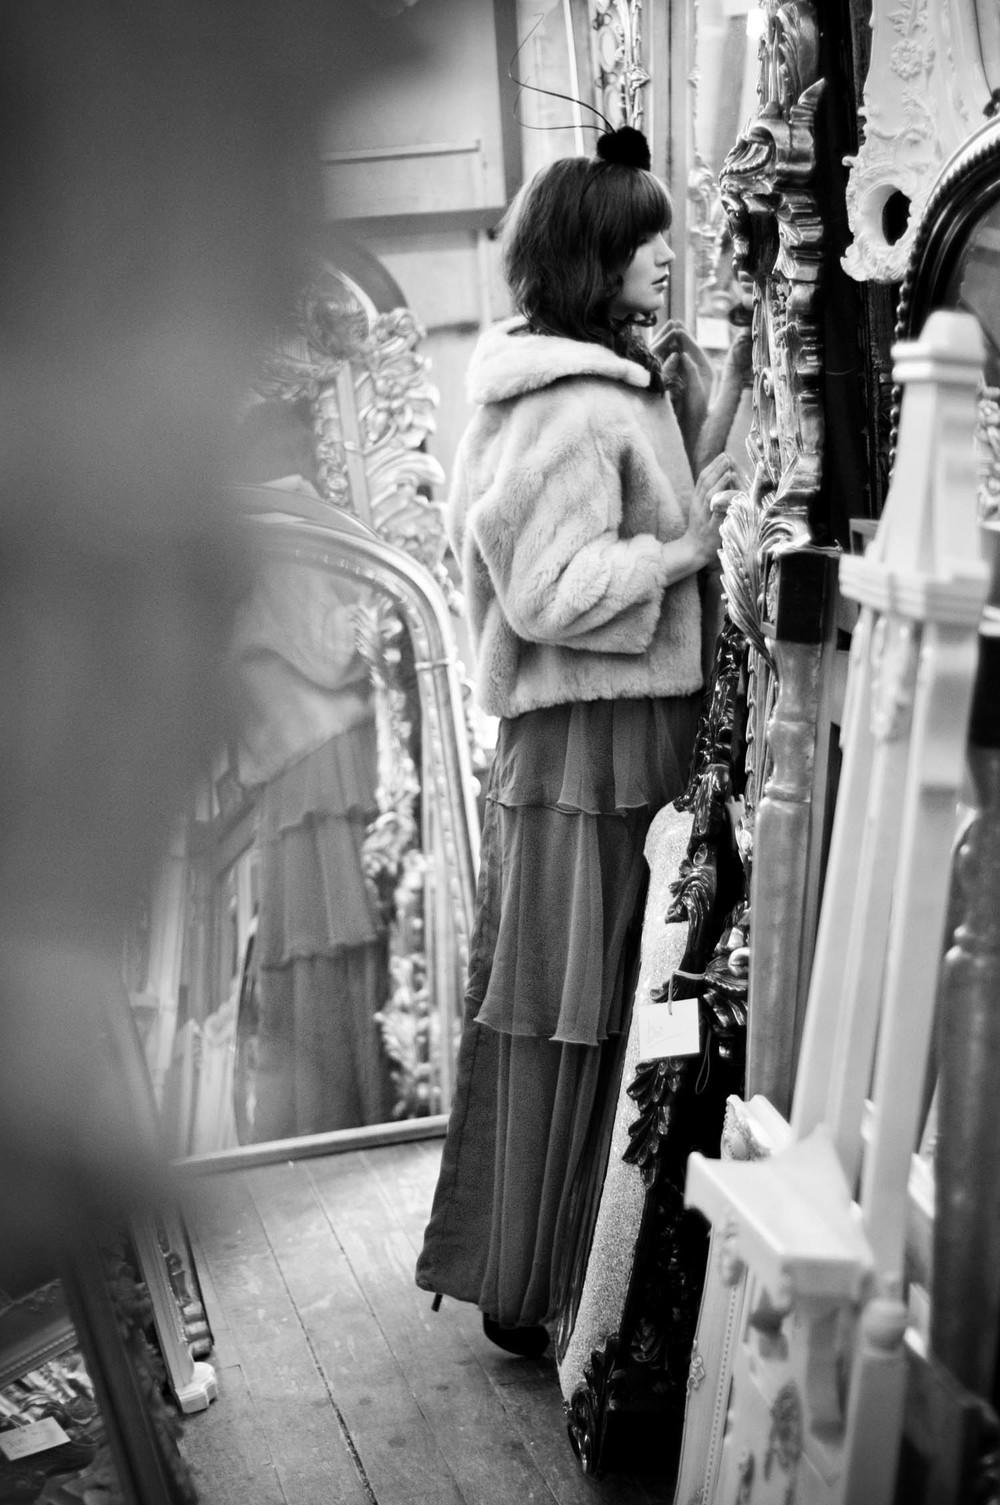 Model in Mirror Shop